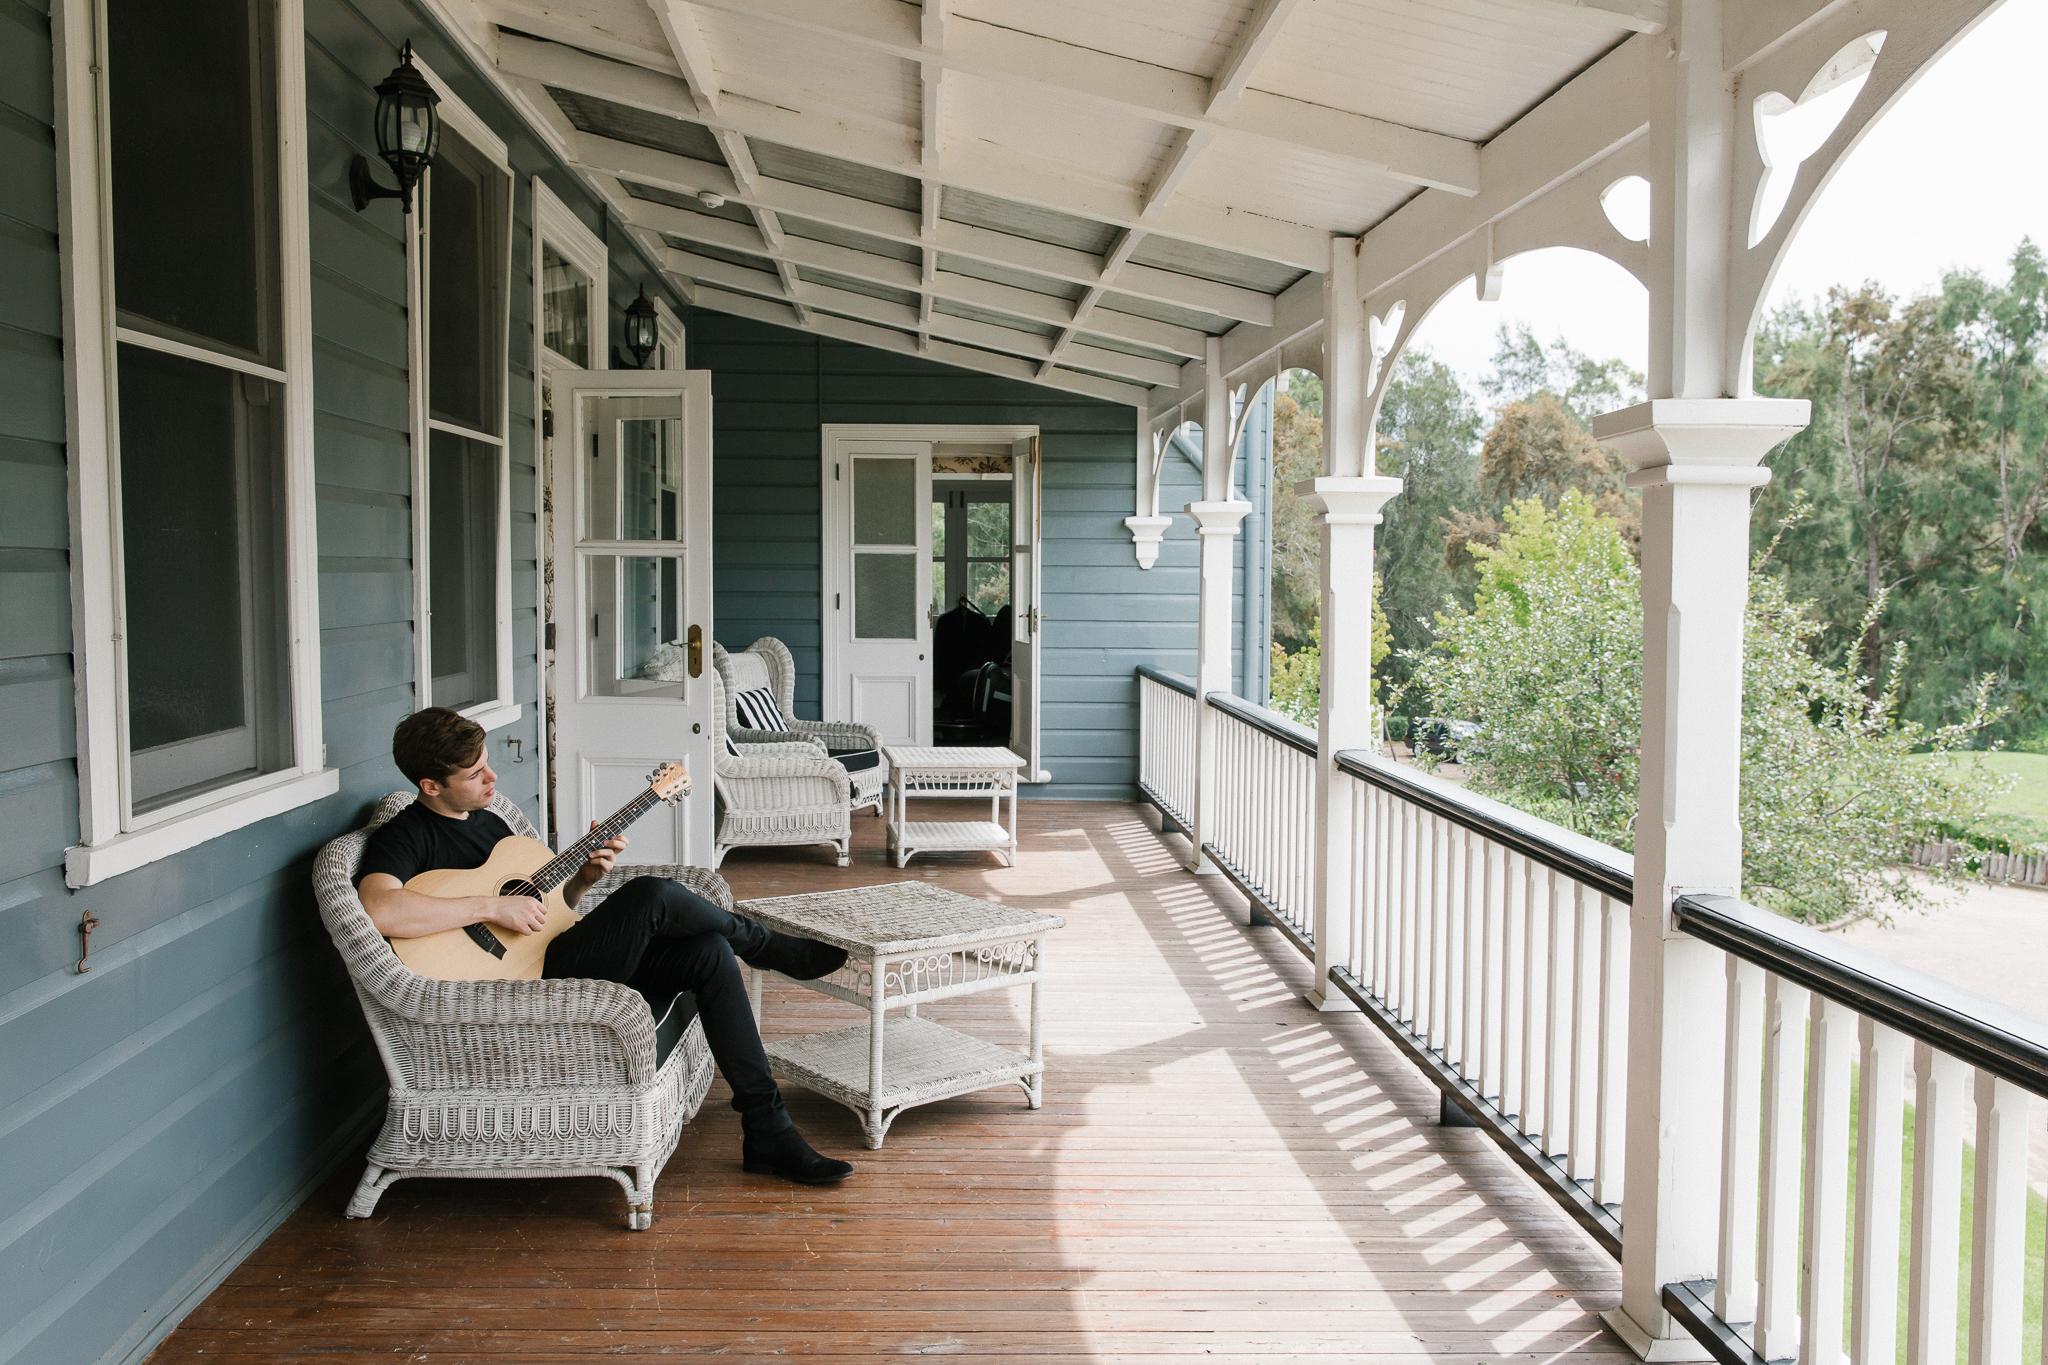 Steph&Josh2017__credit_OneDaySomewhere-45.jpg